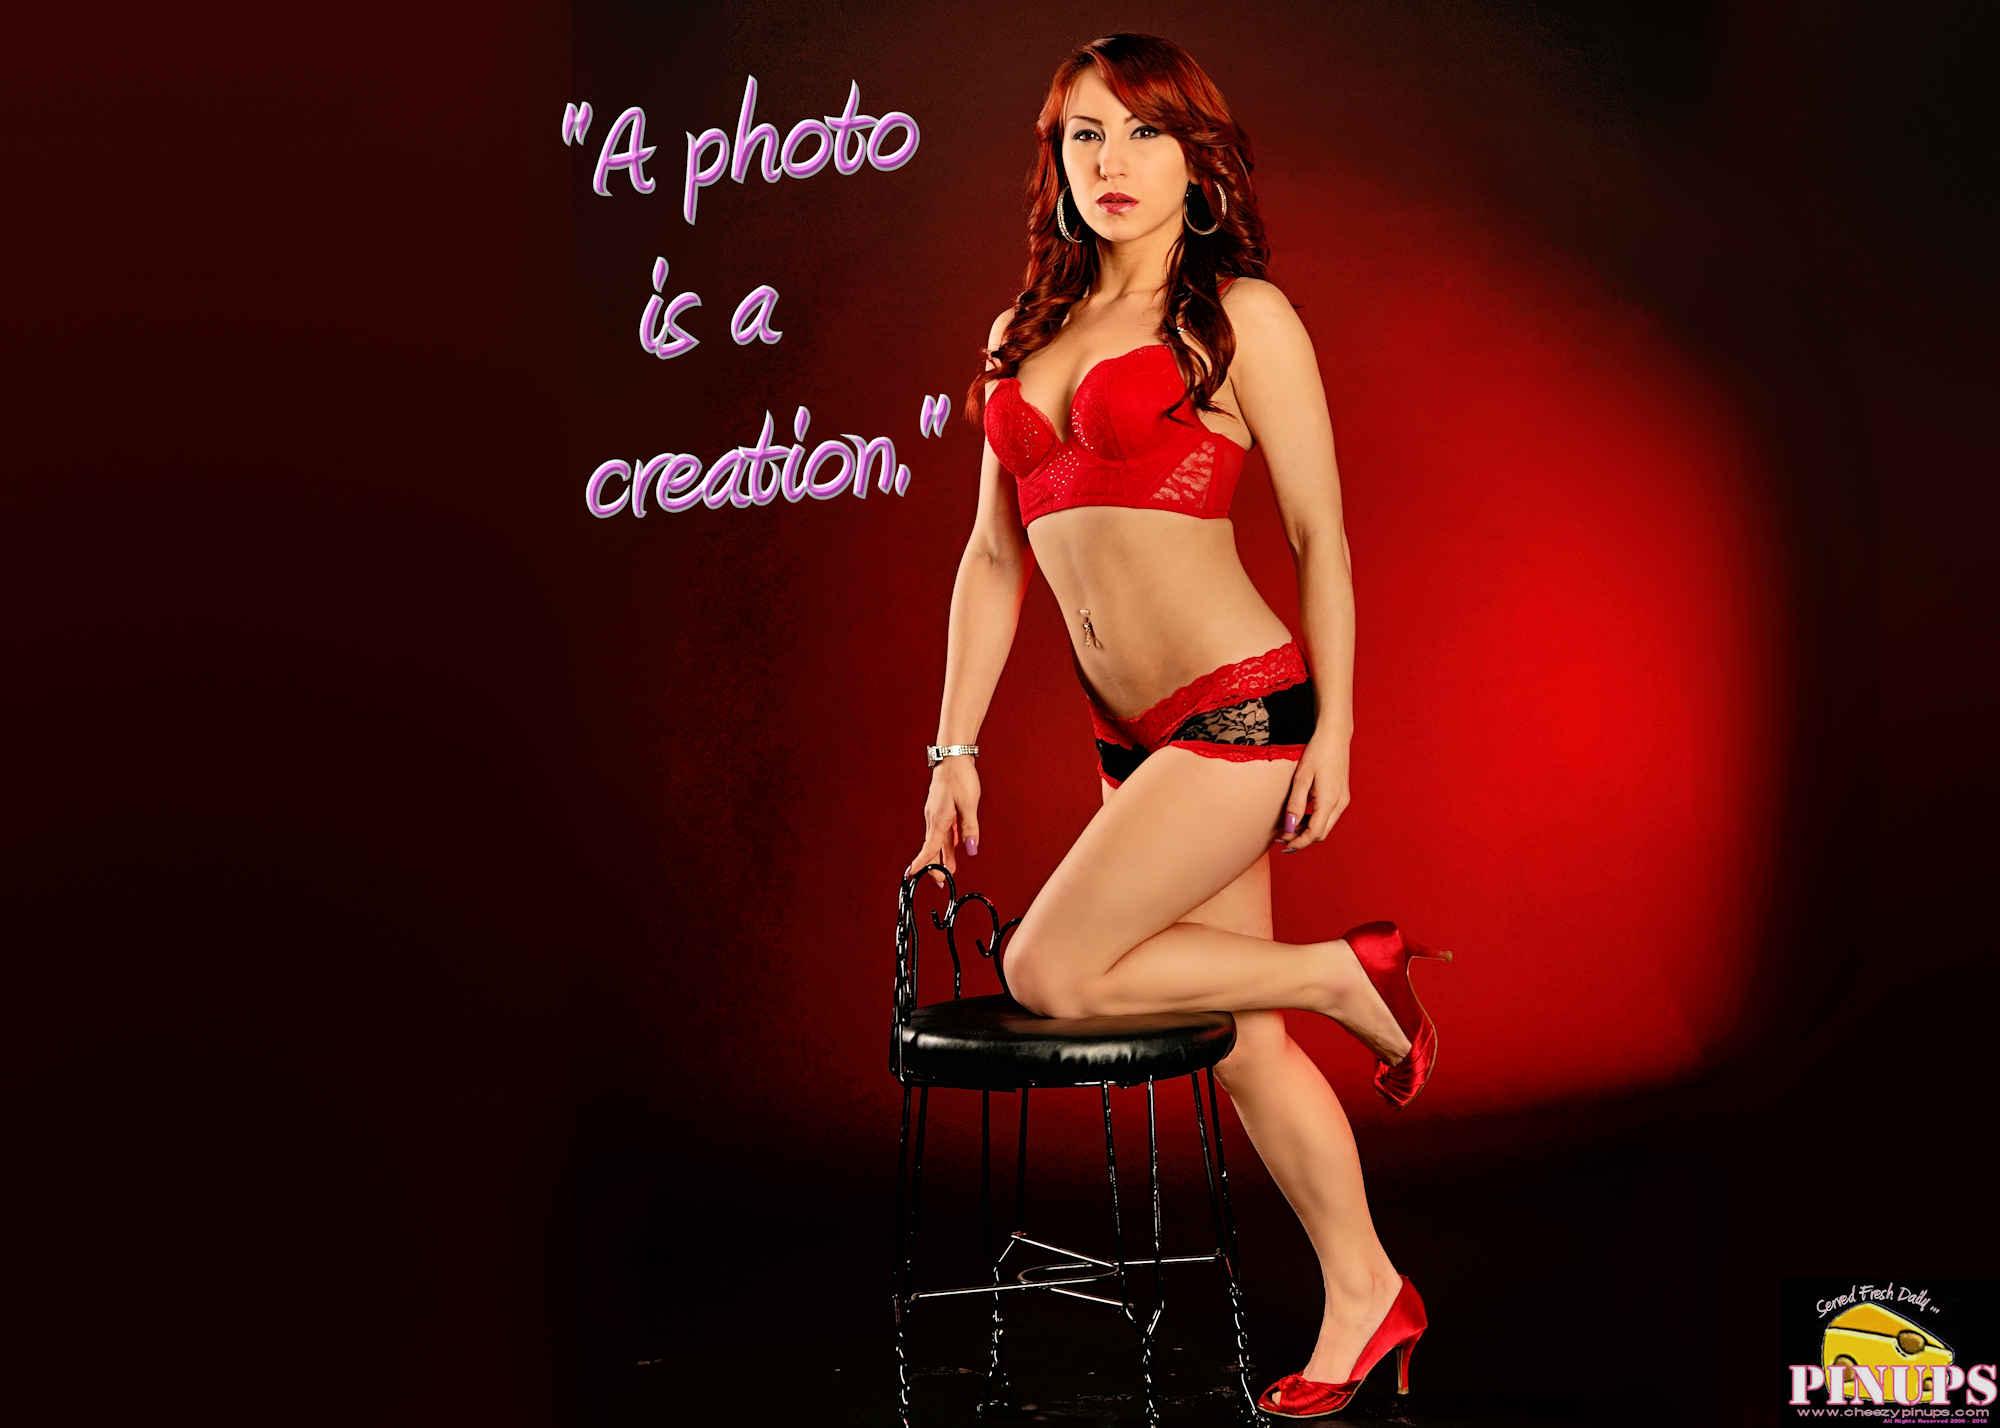 "Cheezy Pinup - March 10, 2018 ""A photo is a creation."" - Eva Herzigova Model: @StrawberryShortKaye"